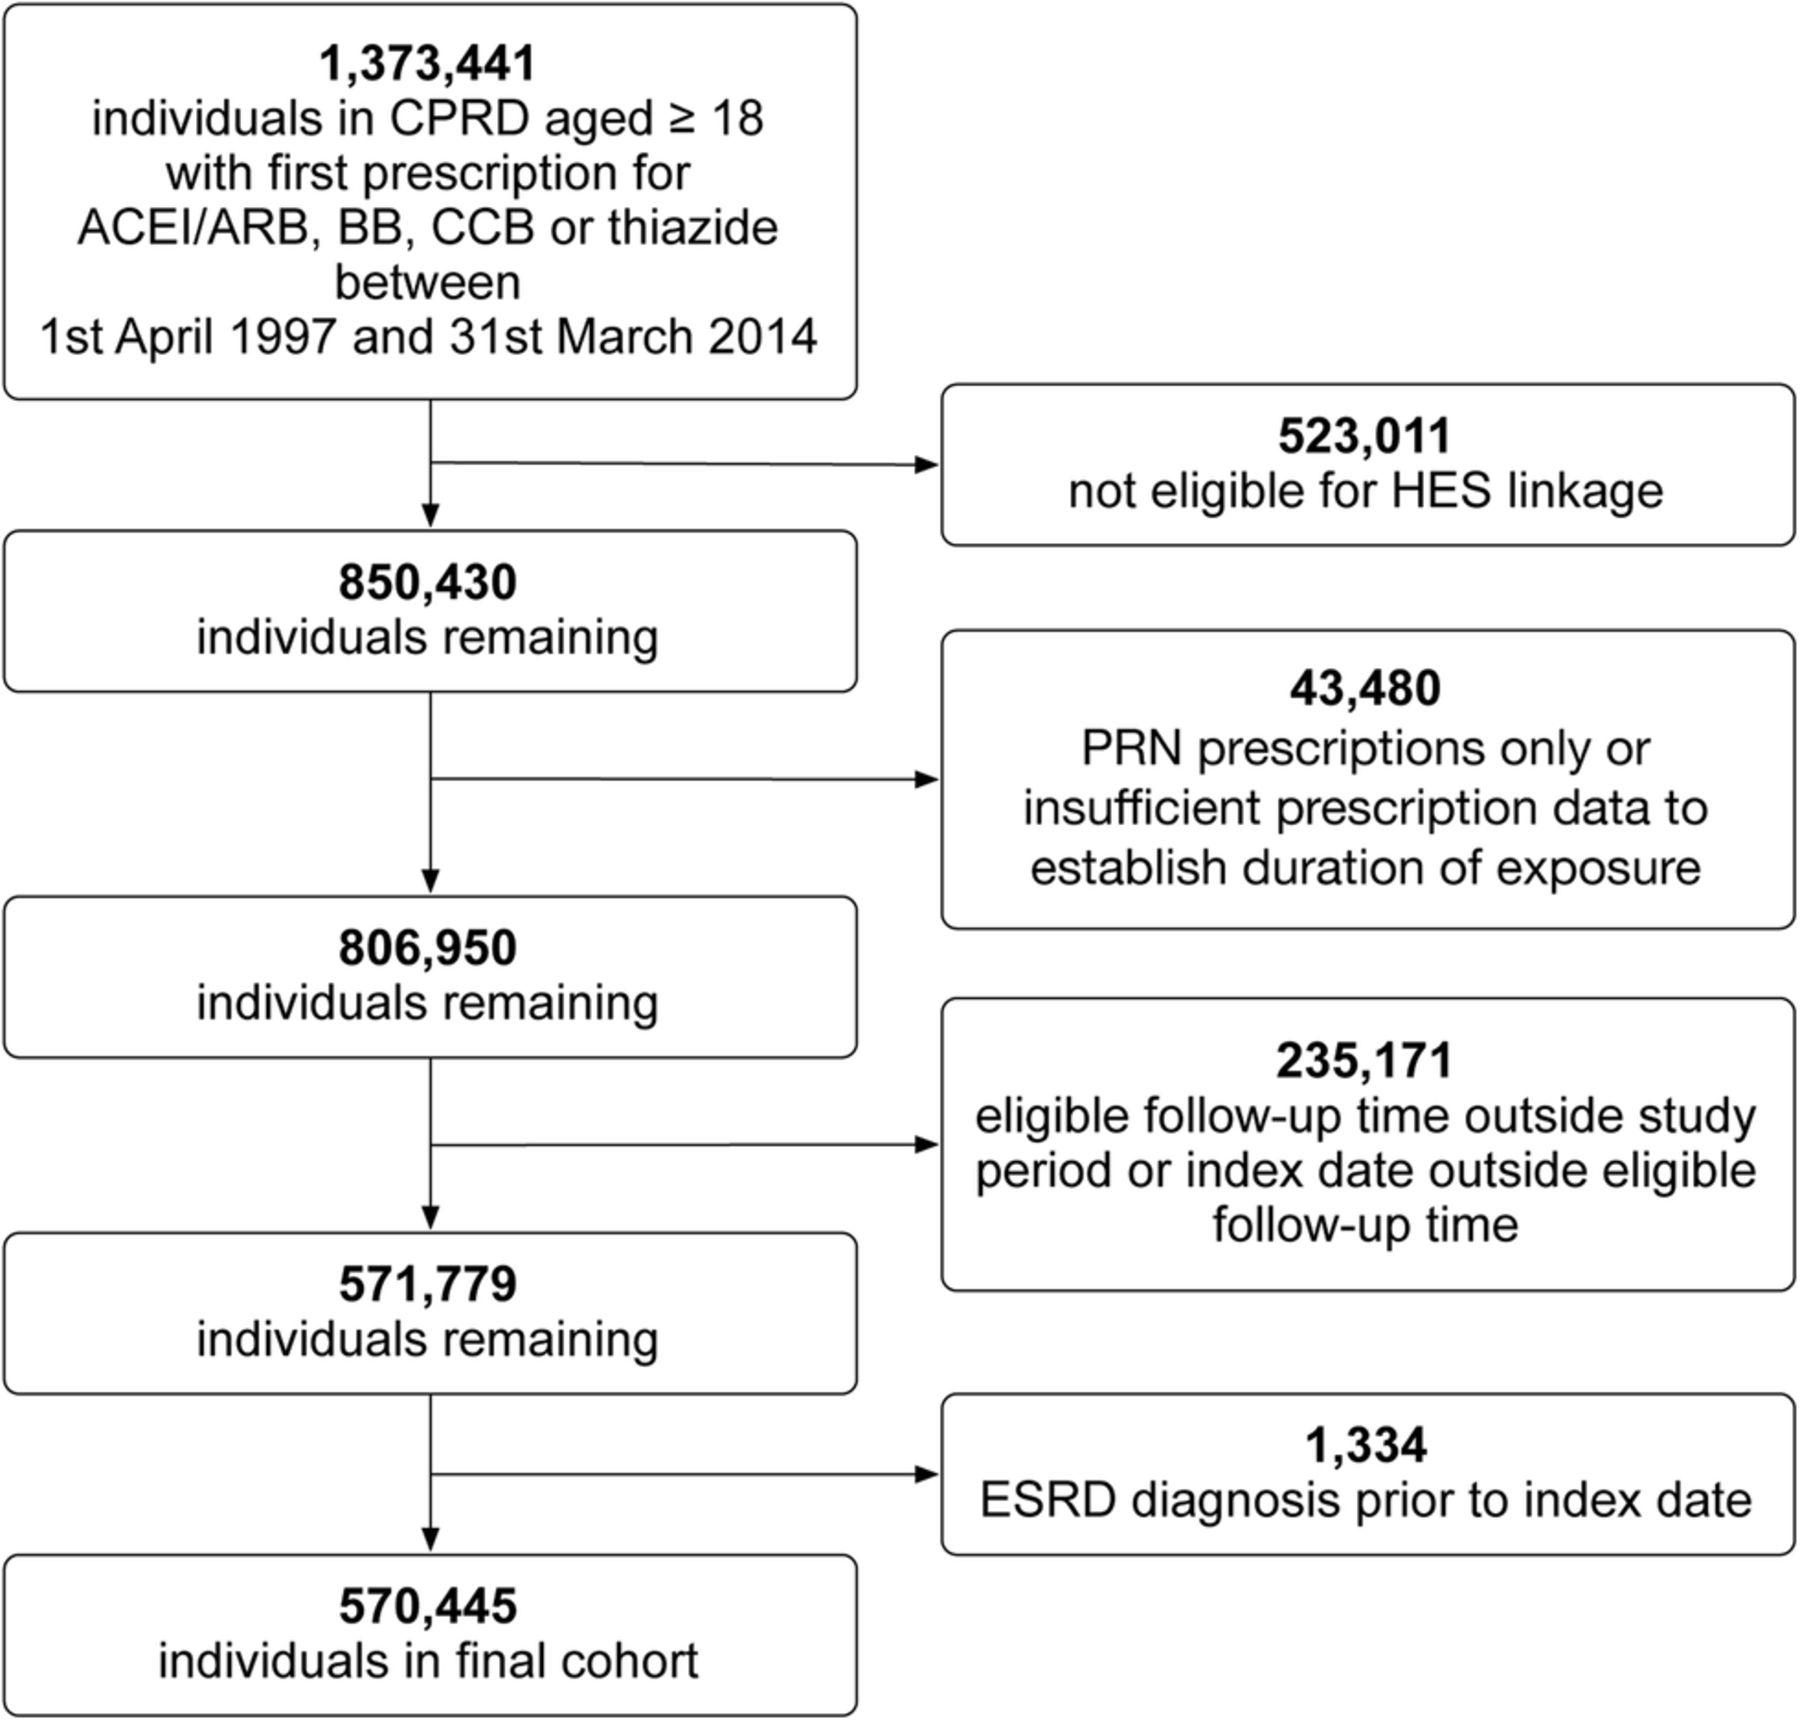 Prescription Of Renin U2013angiotensin System Blockers And Risk